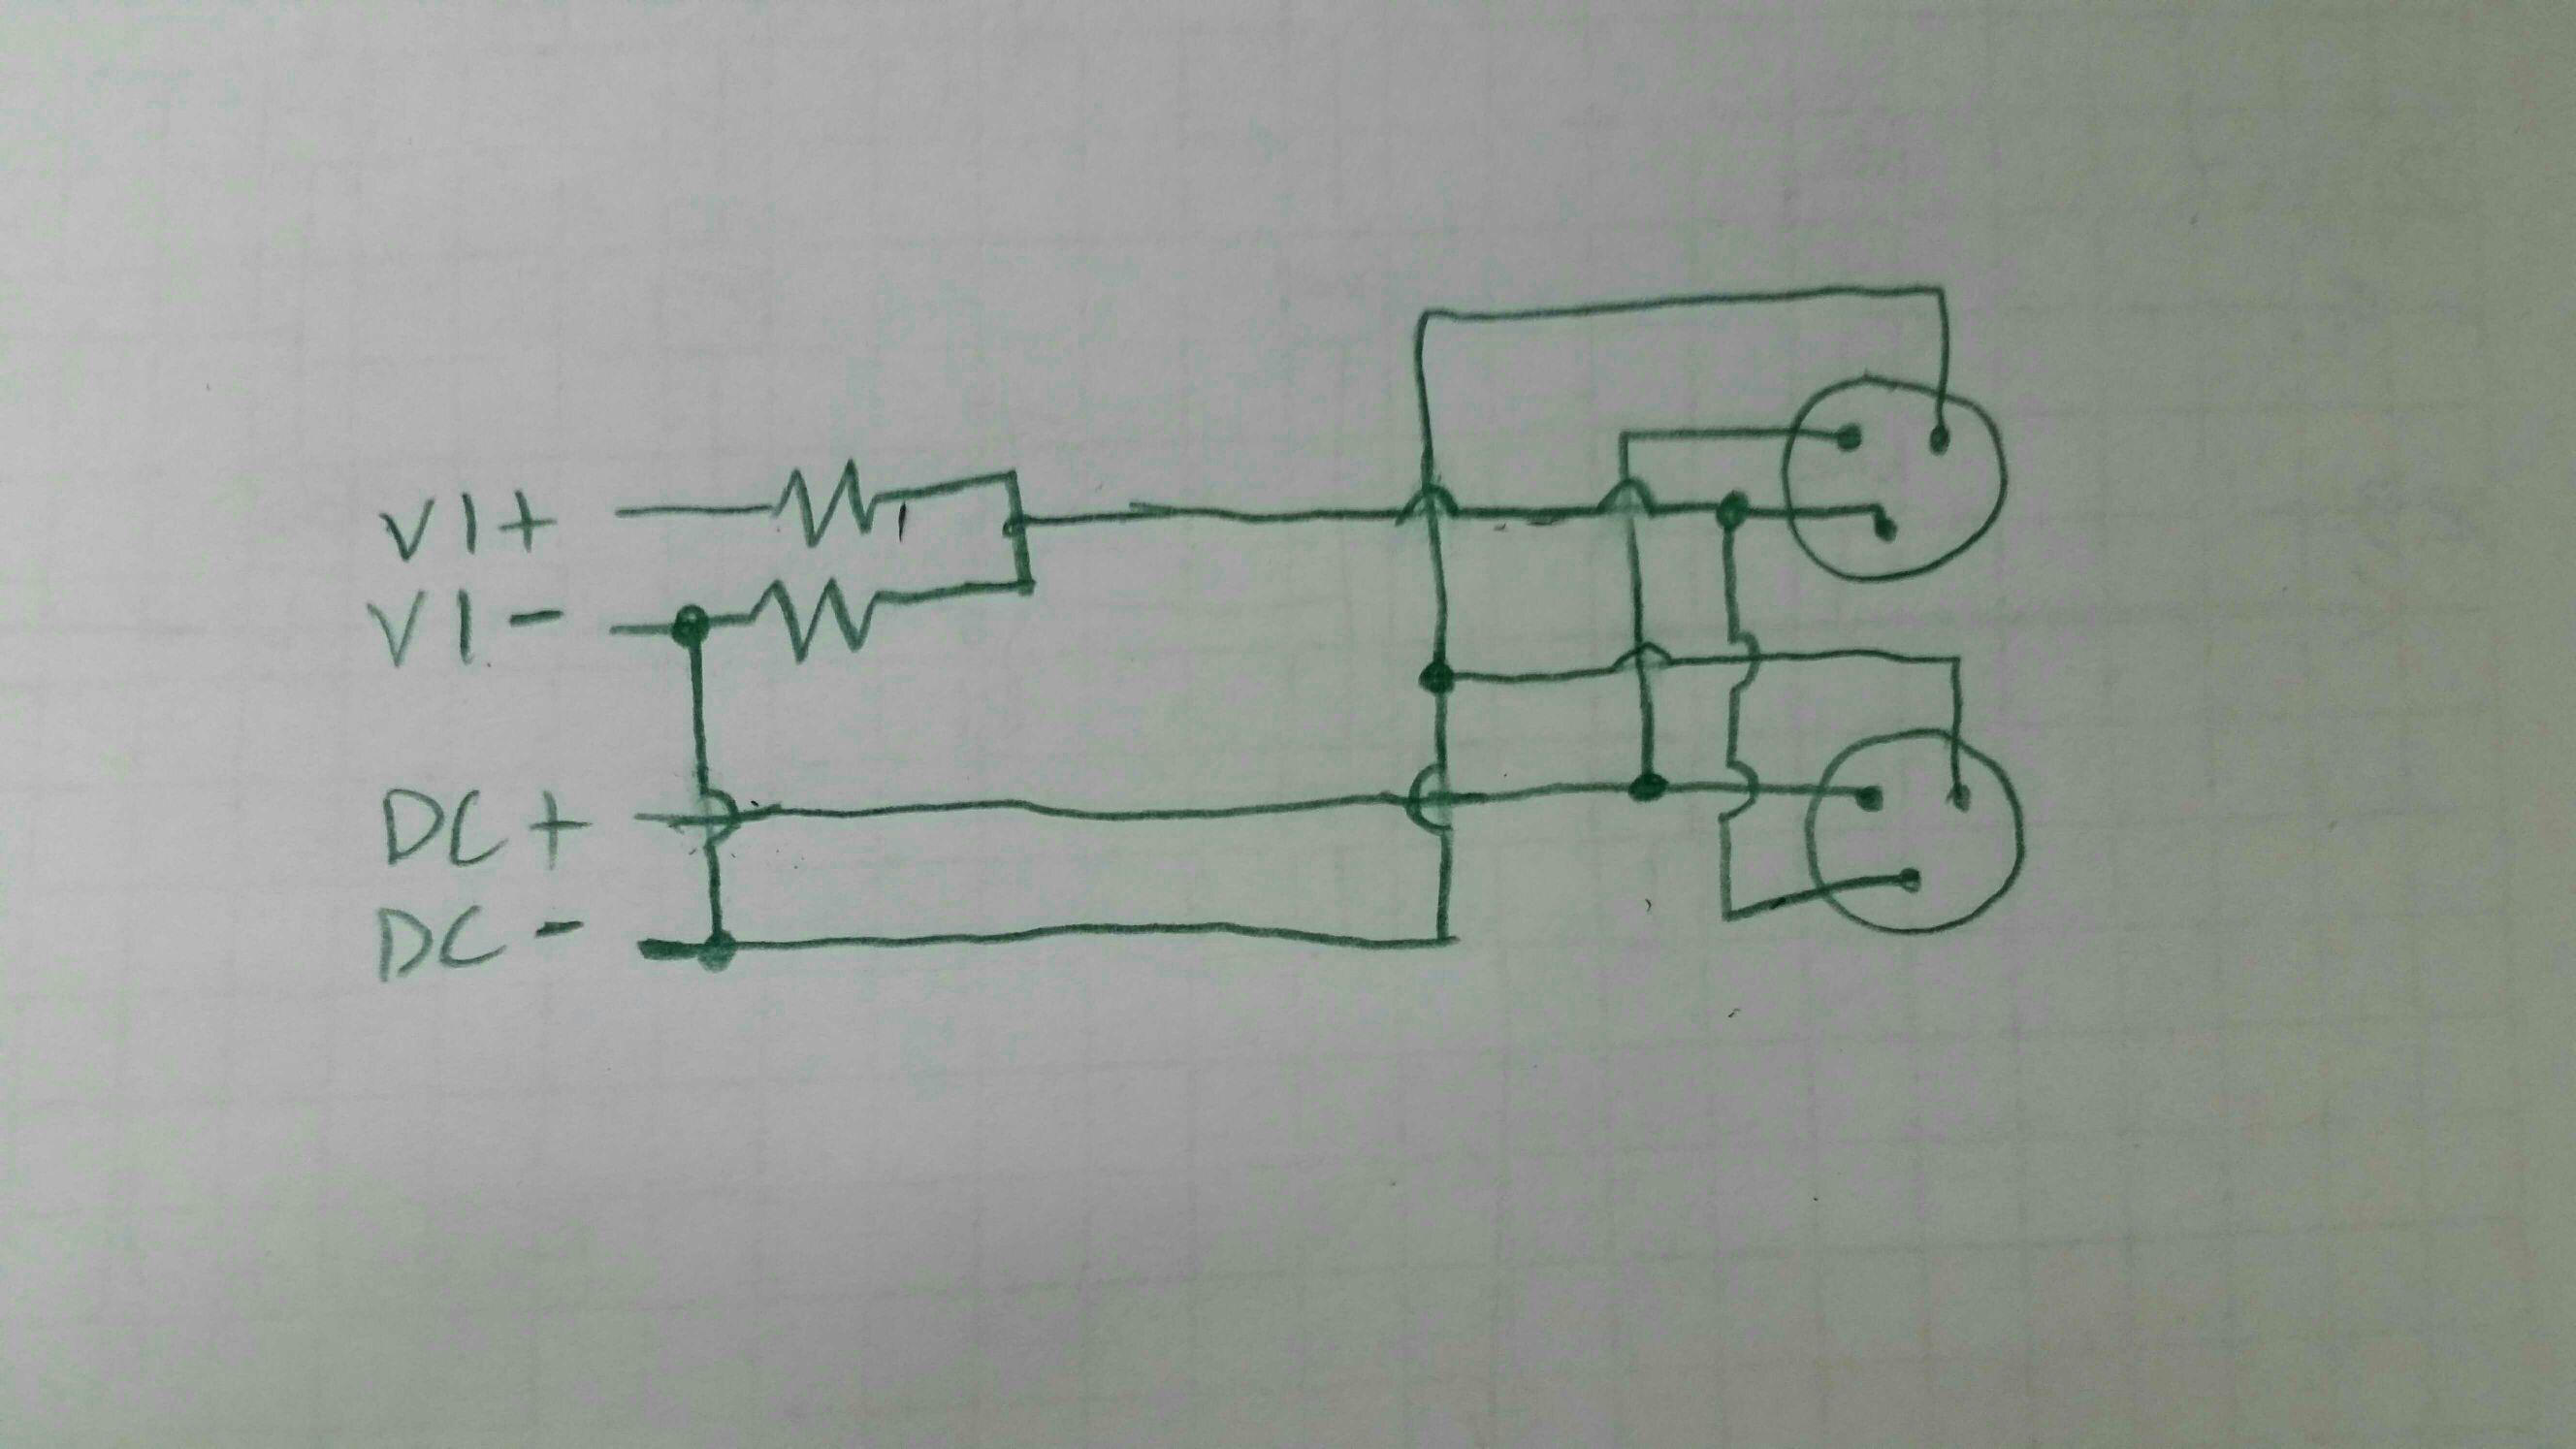 neptune apex wiring diagram automotive wiring diagram u2022 rh nfluencer co Neptune Apex Controller Programming Neptune Apex Plug Power